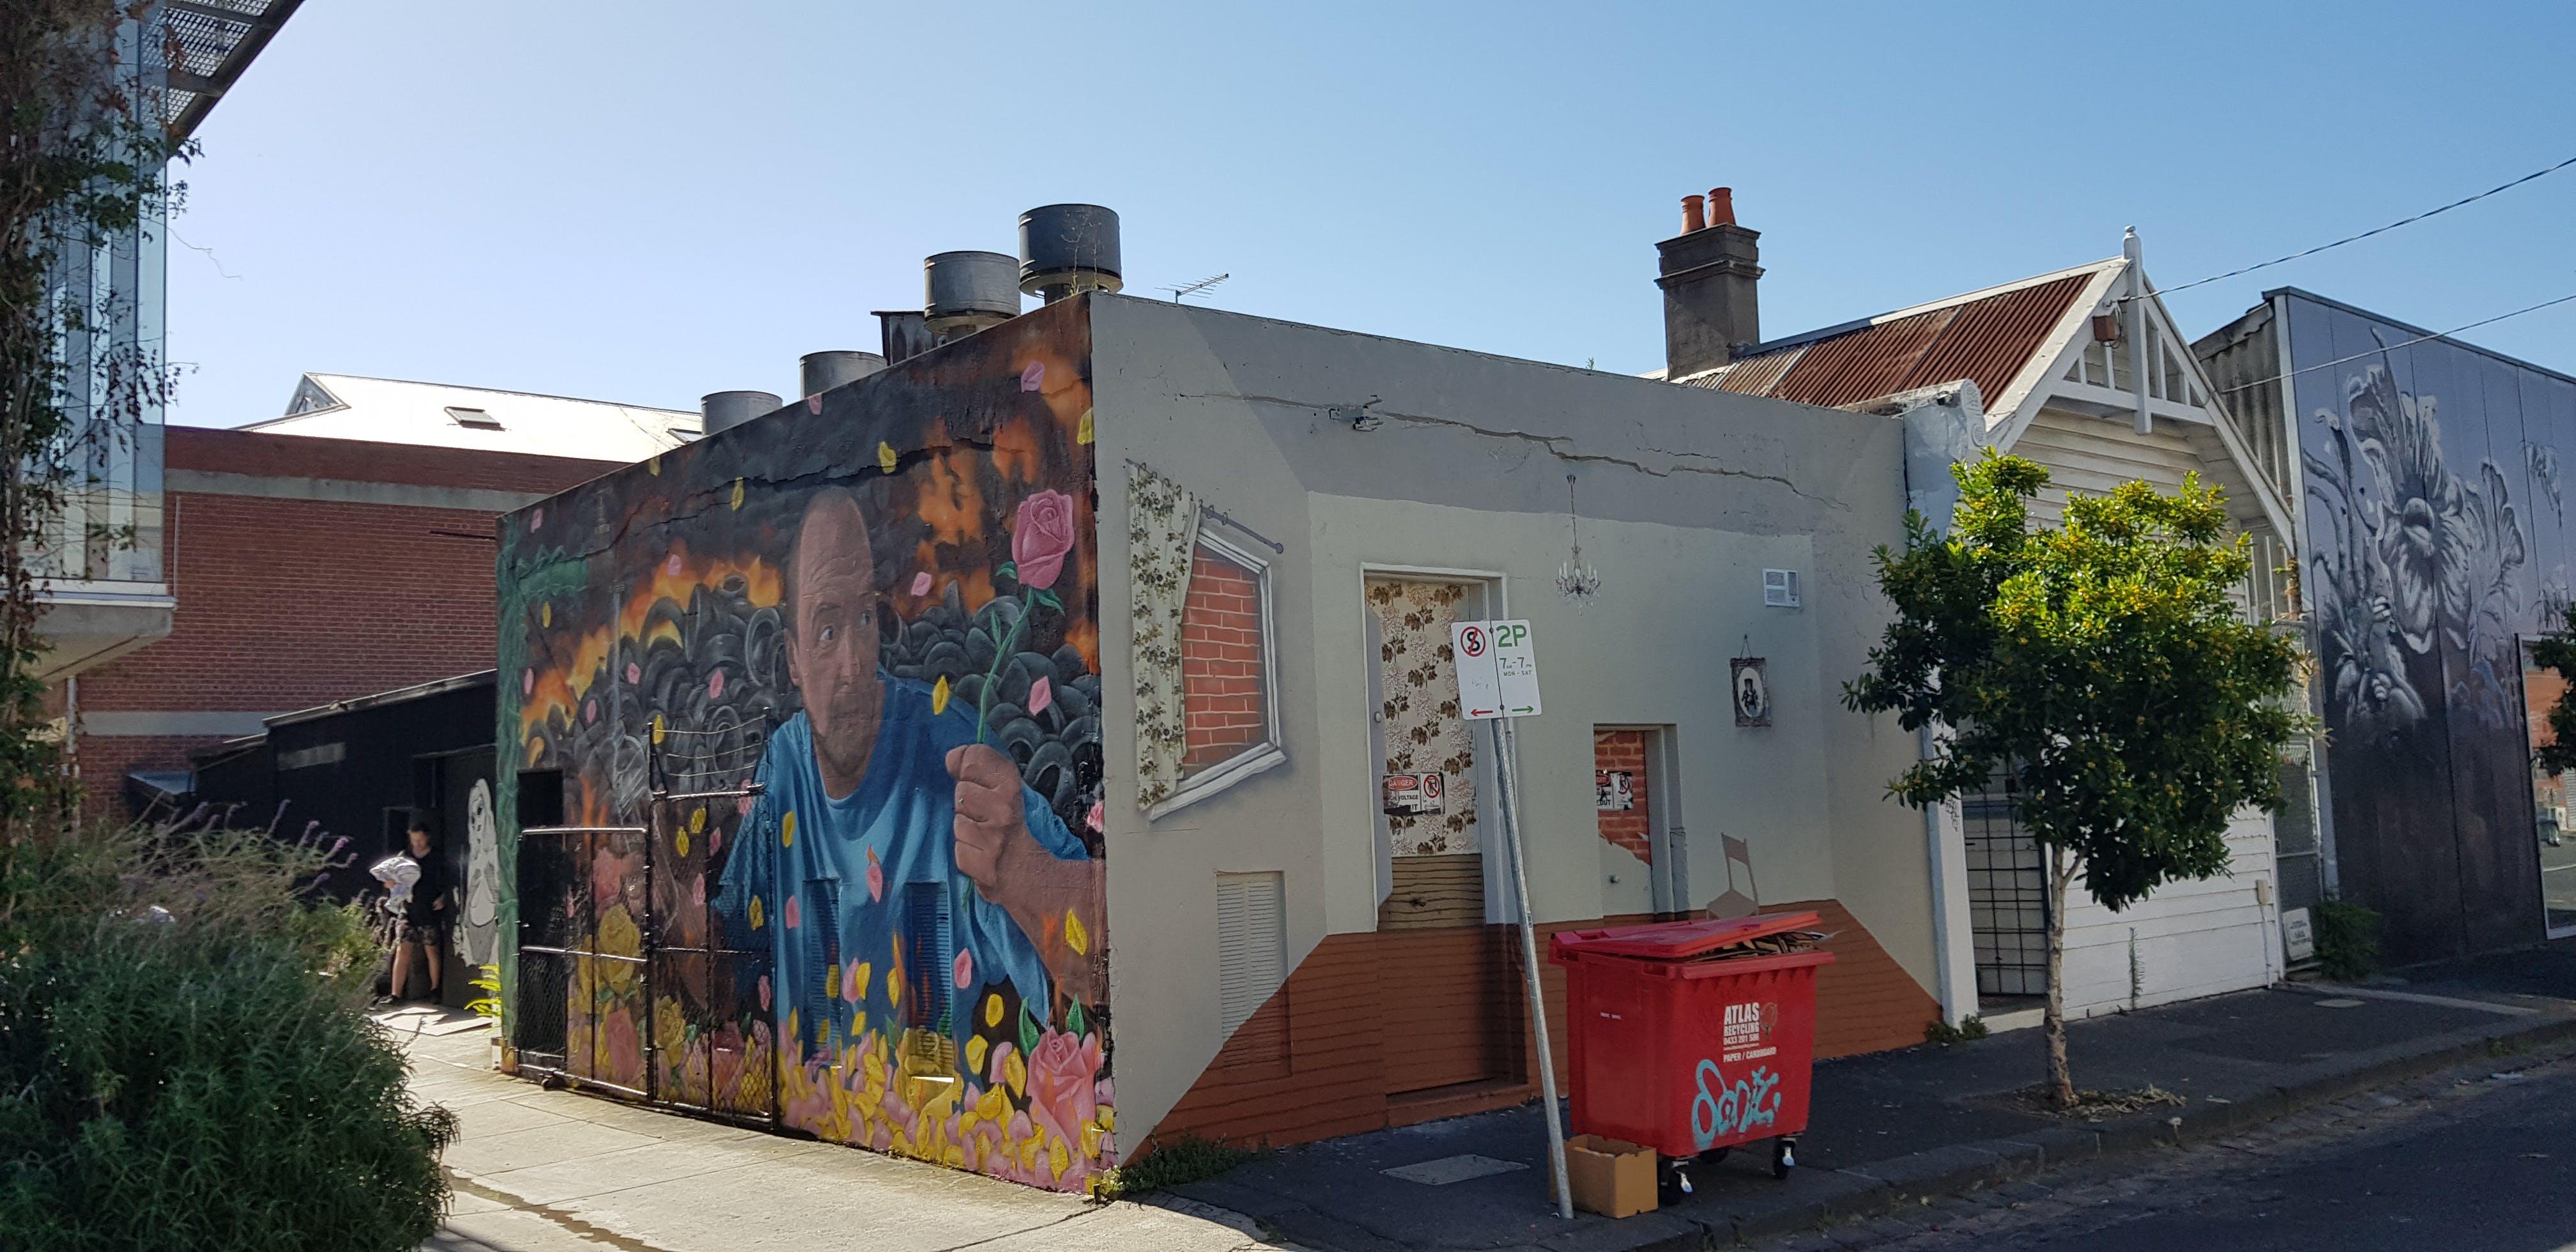 Budd street gallery , multi-use area at Budd street gallery, image 1